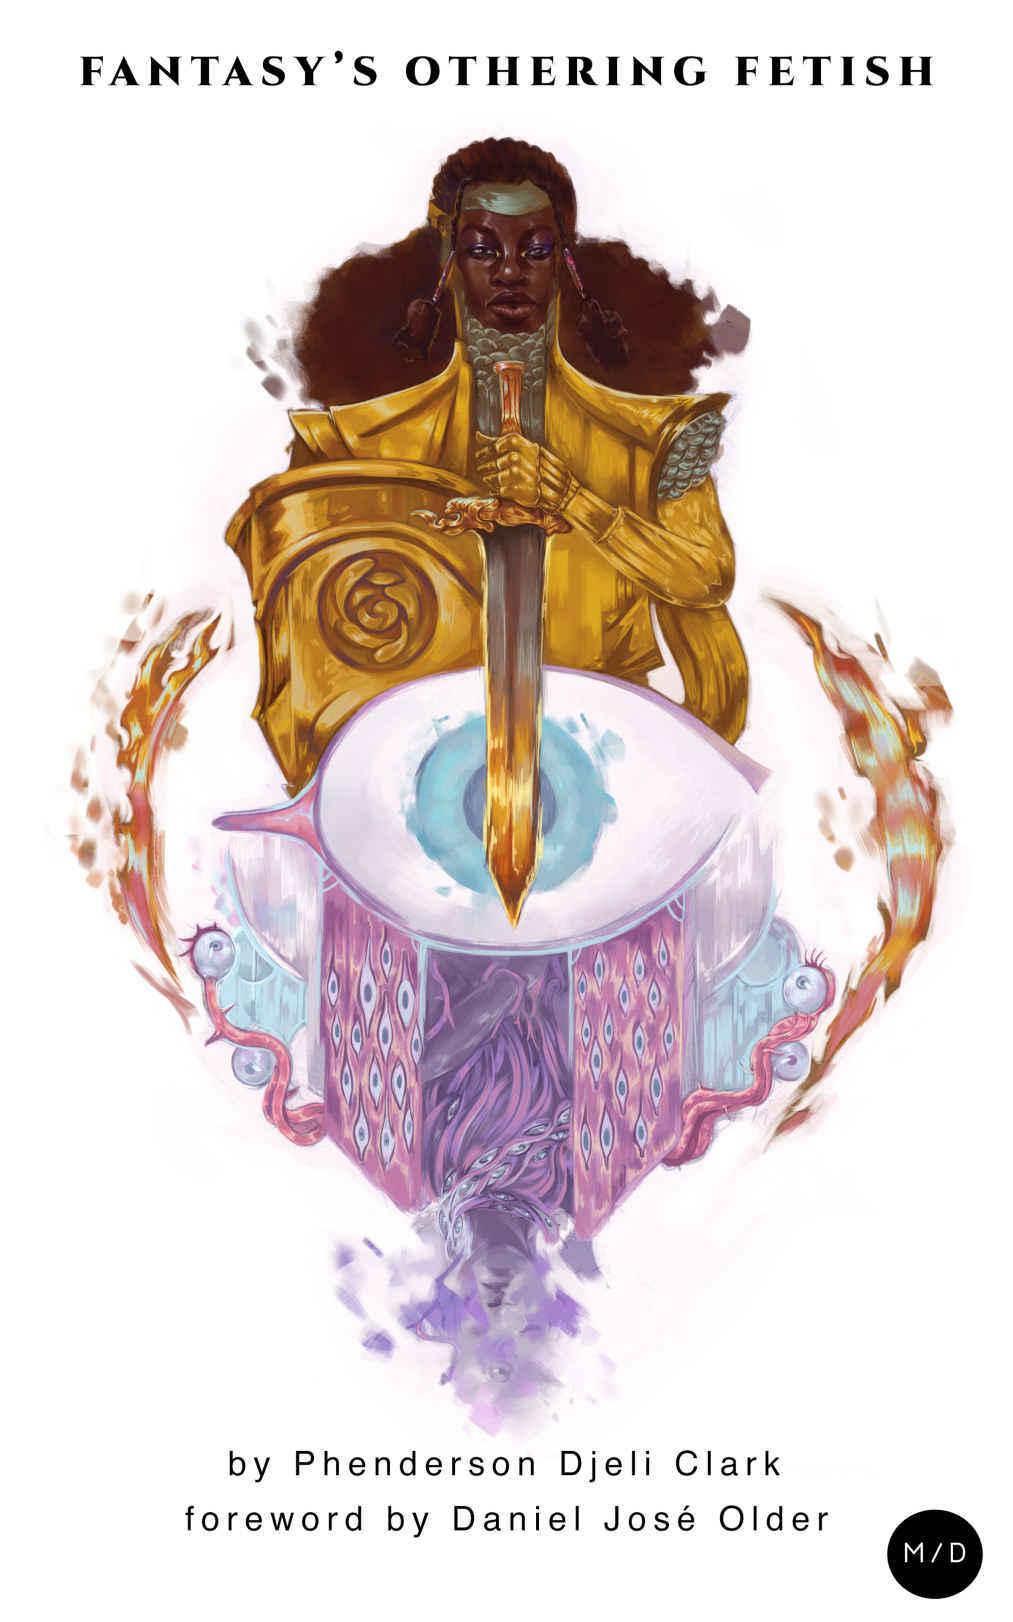 Fantasy's Othering Fetish